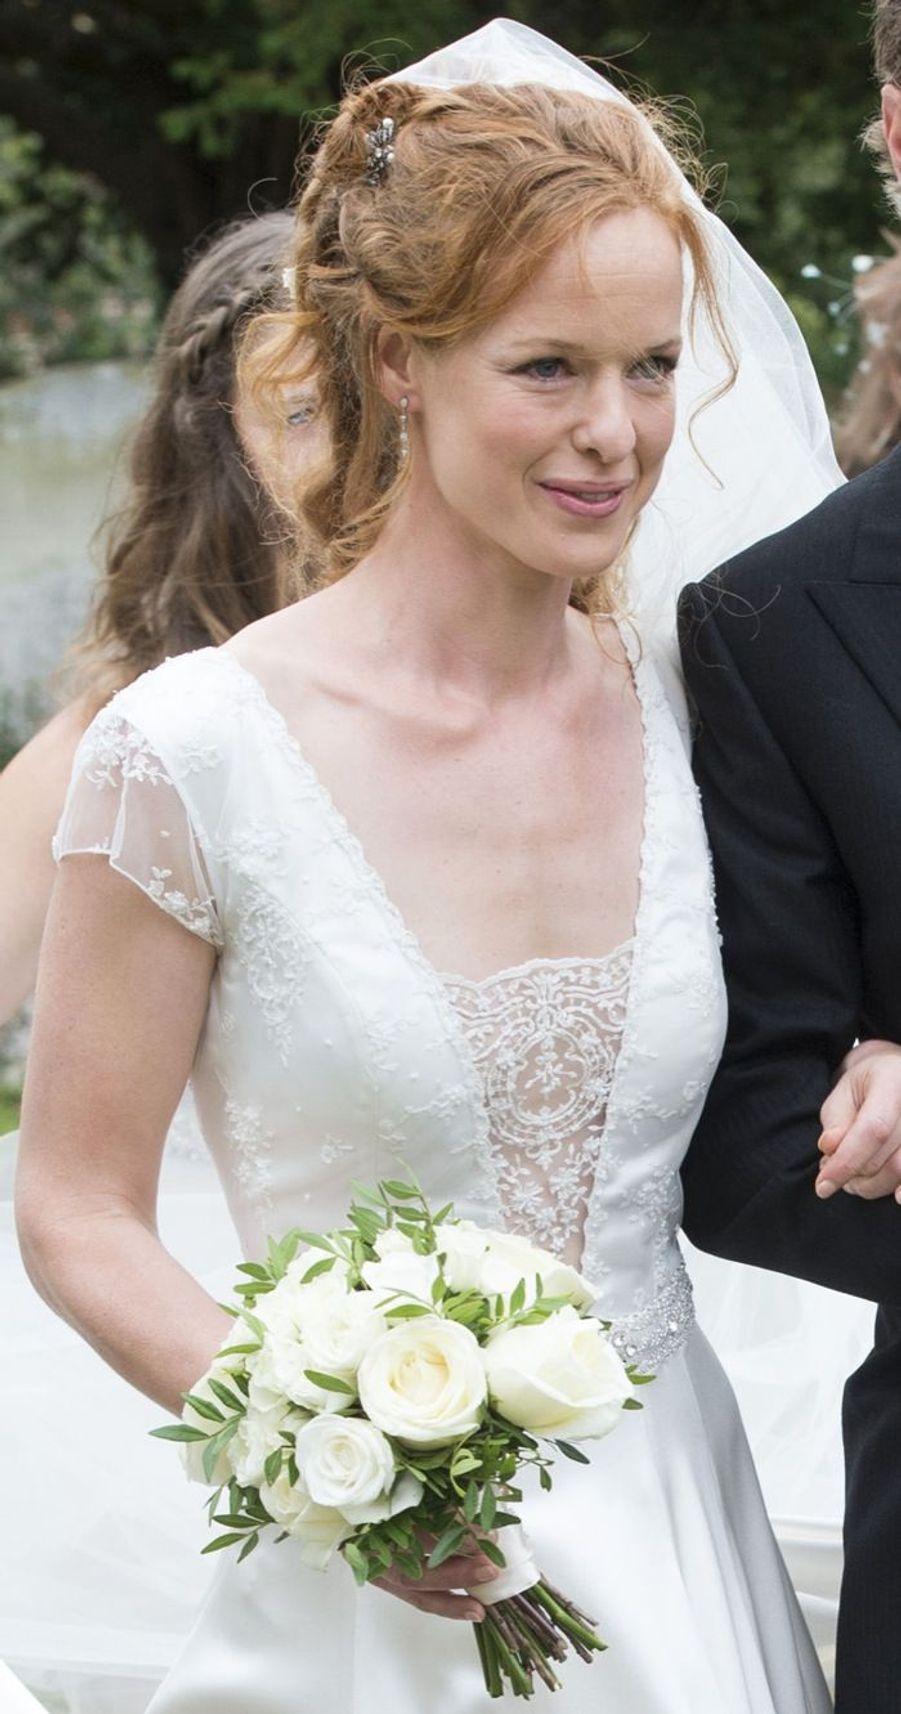 Alicia Fox-Pitt, l'amie de Kate